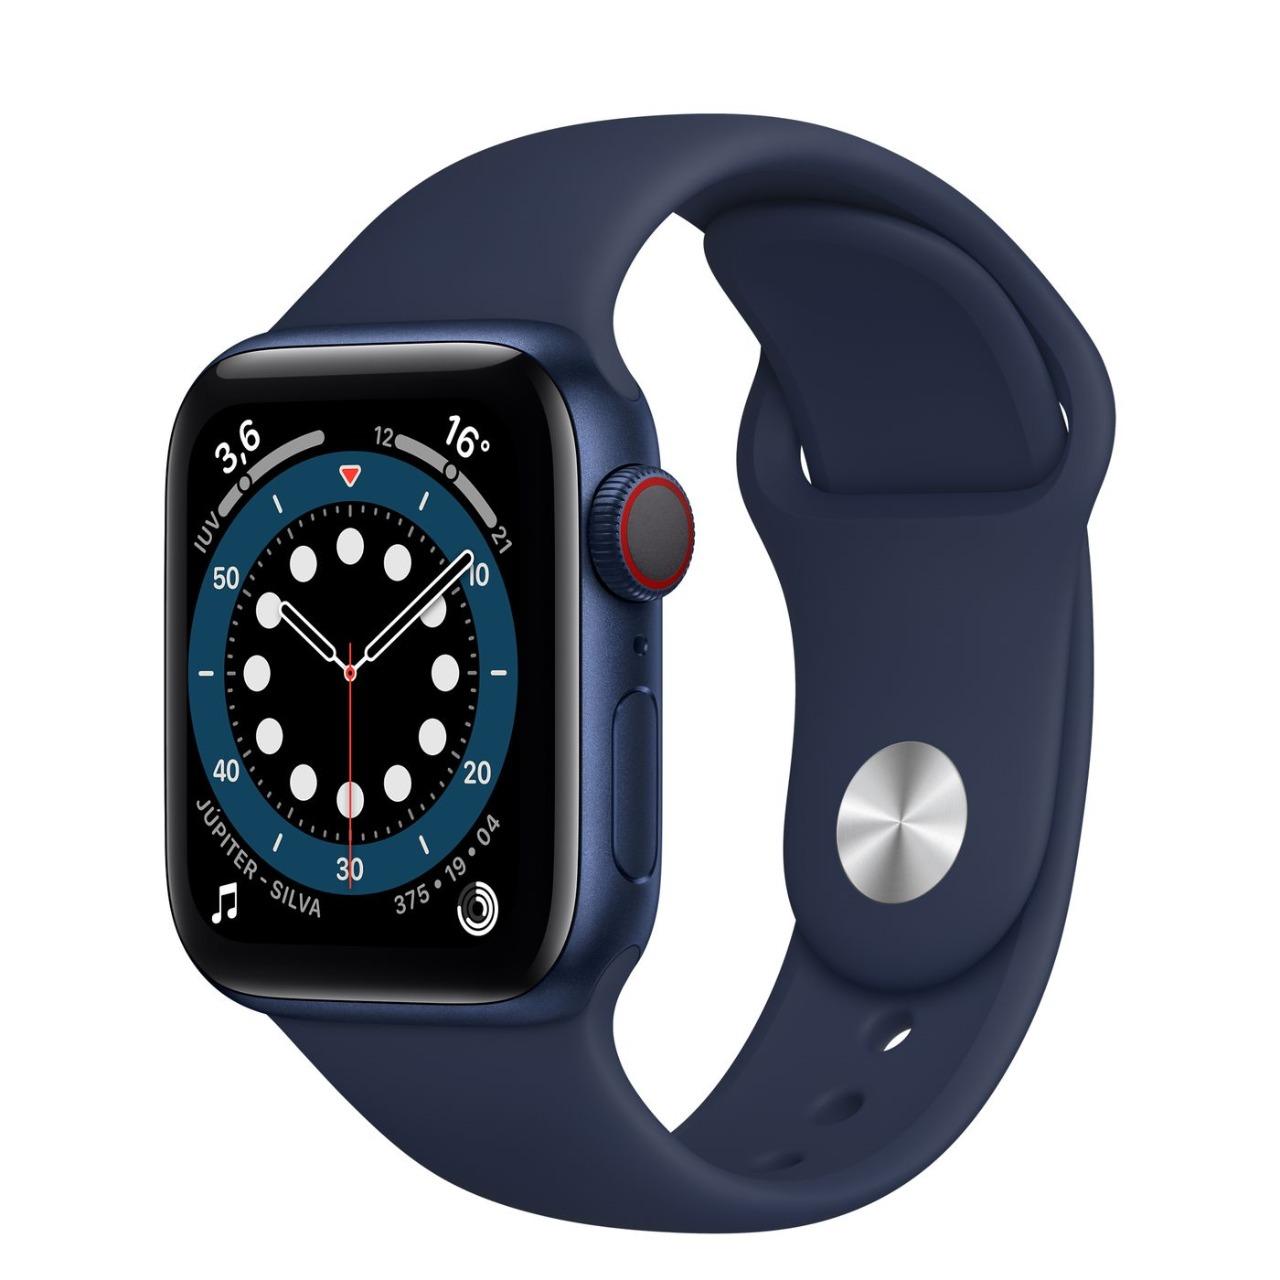 Apple Watch Series 6, Novo 40mm